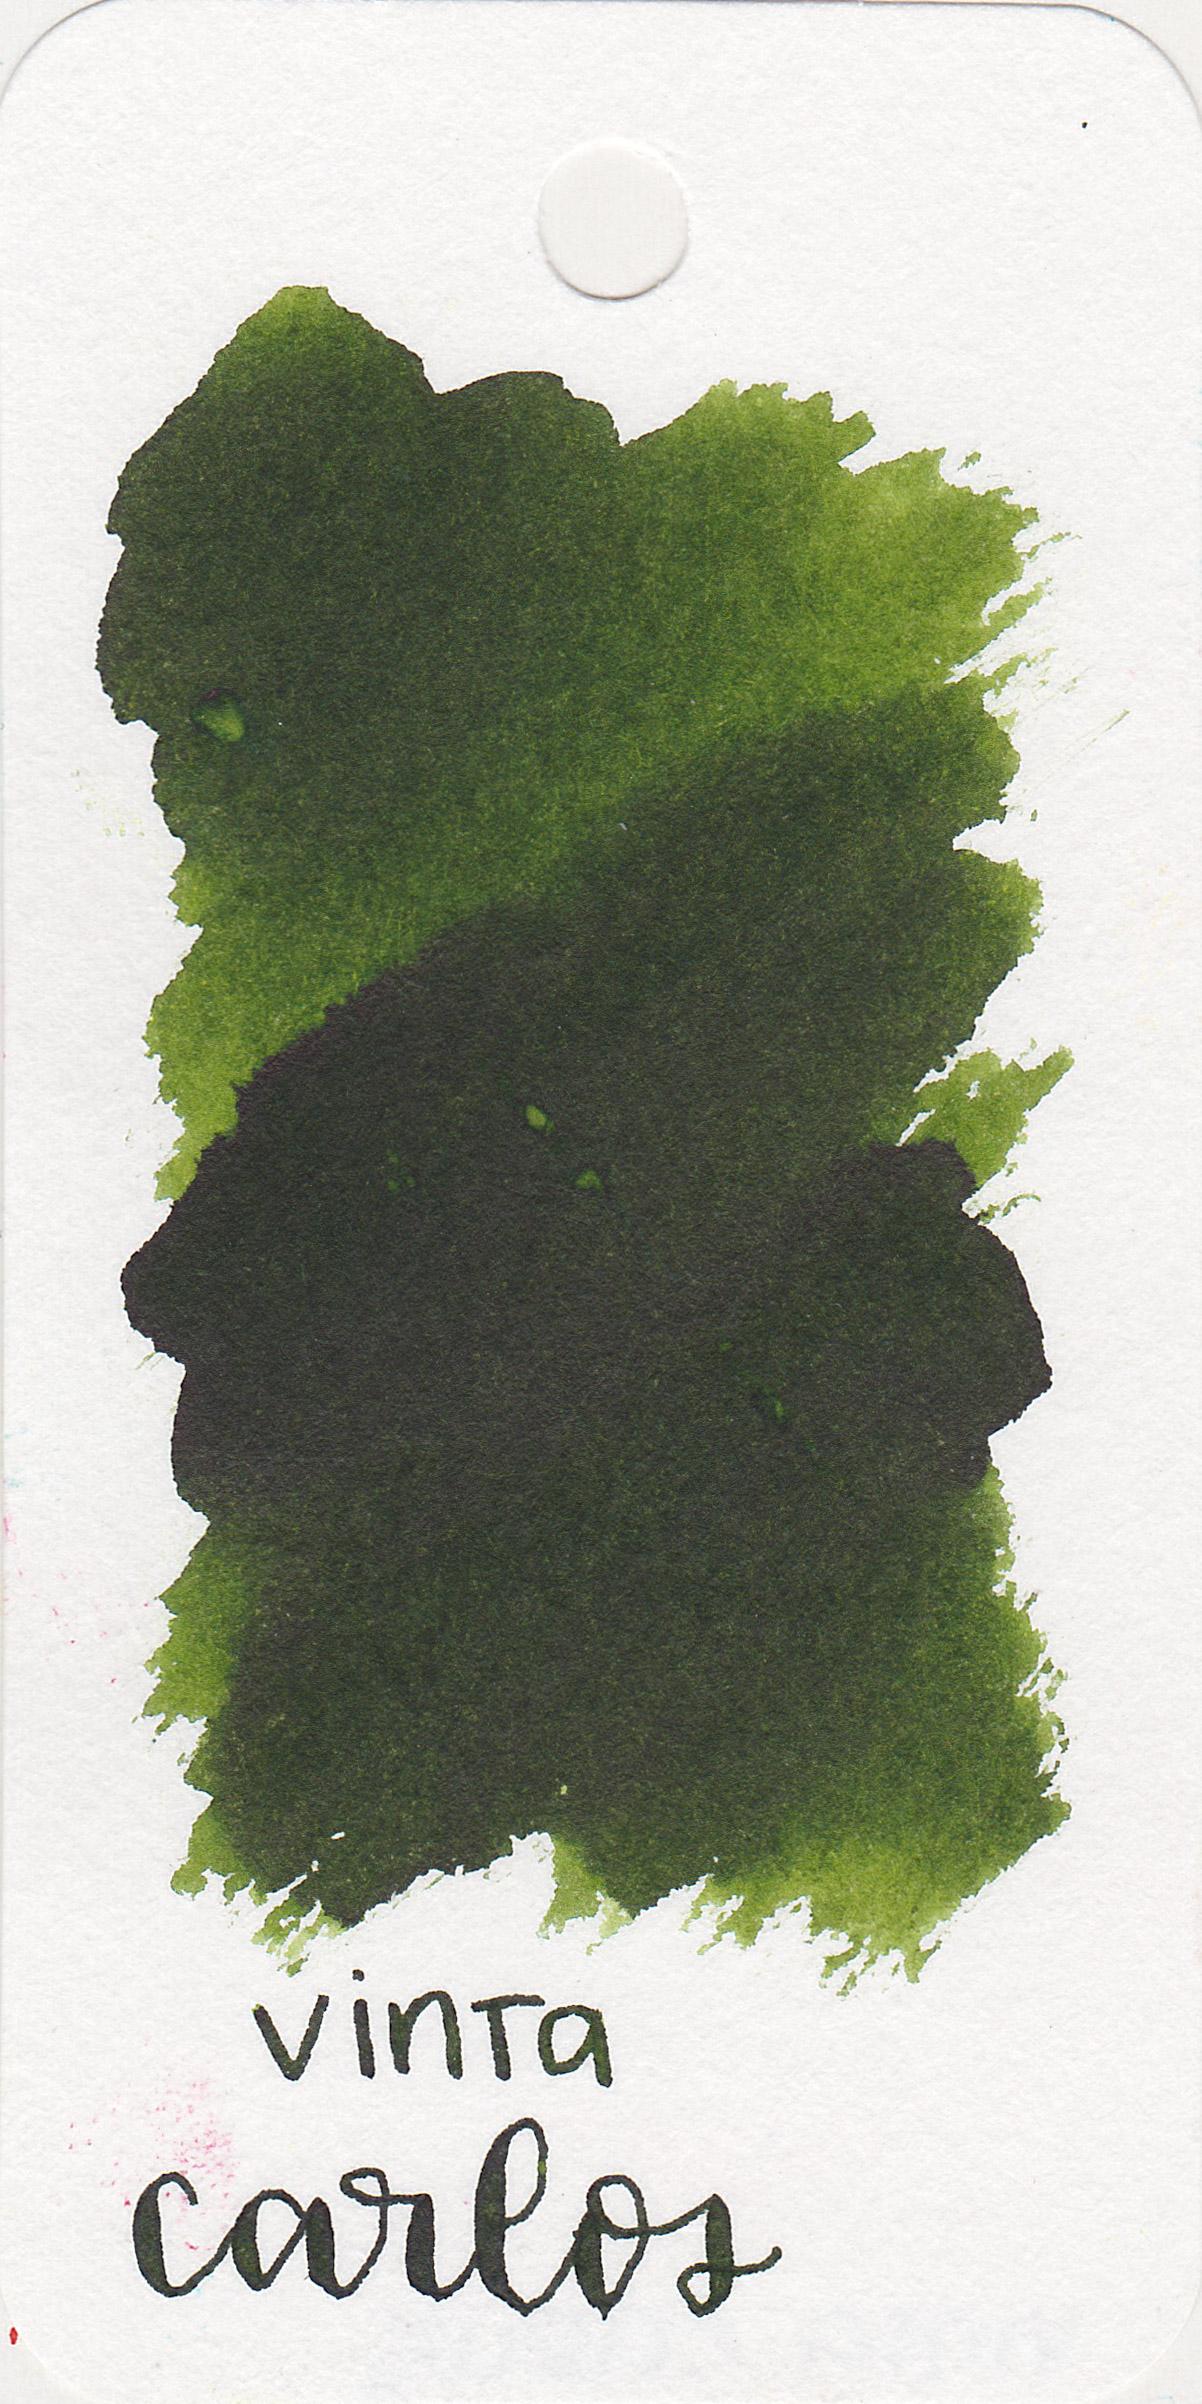 vnt-carlos-1.jpg